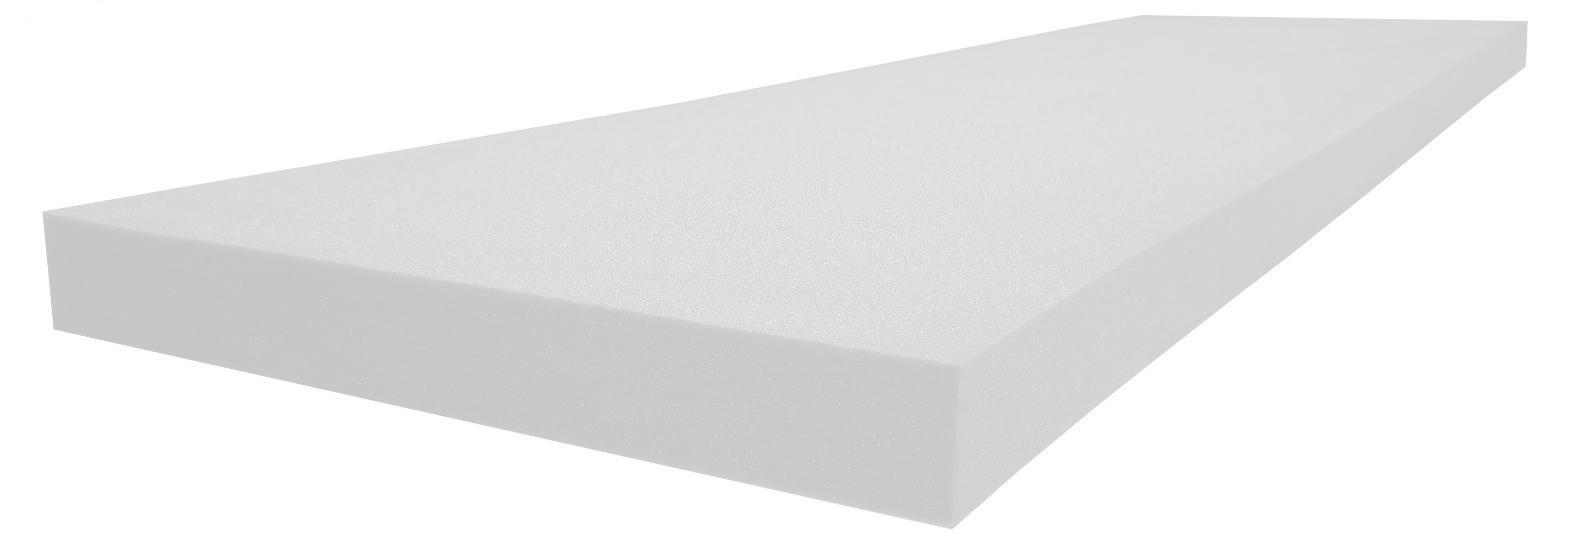 Laser friendly foam used for packaging